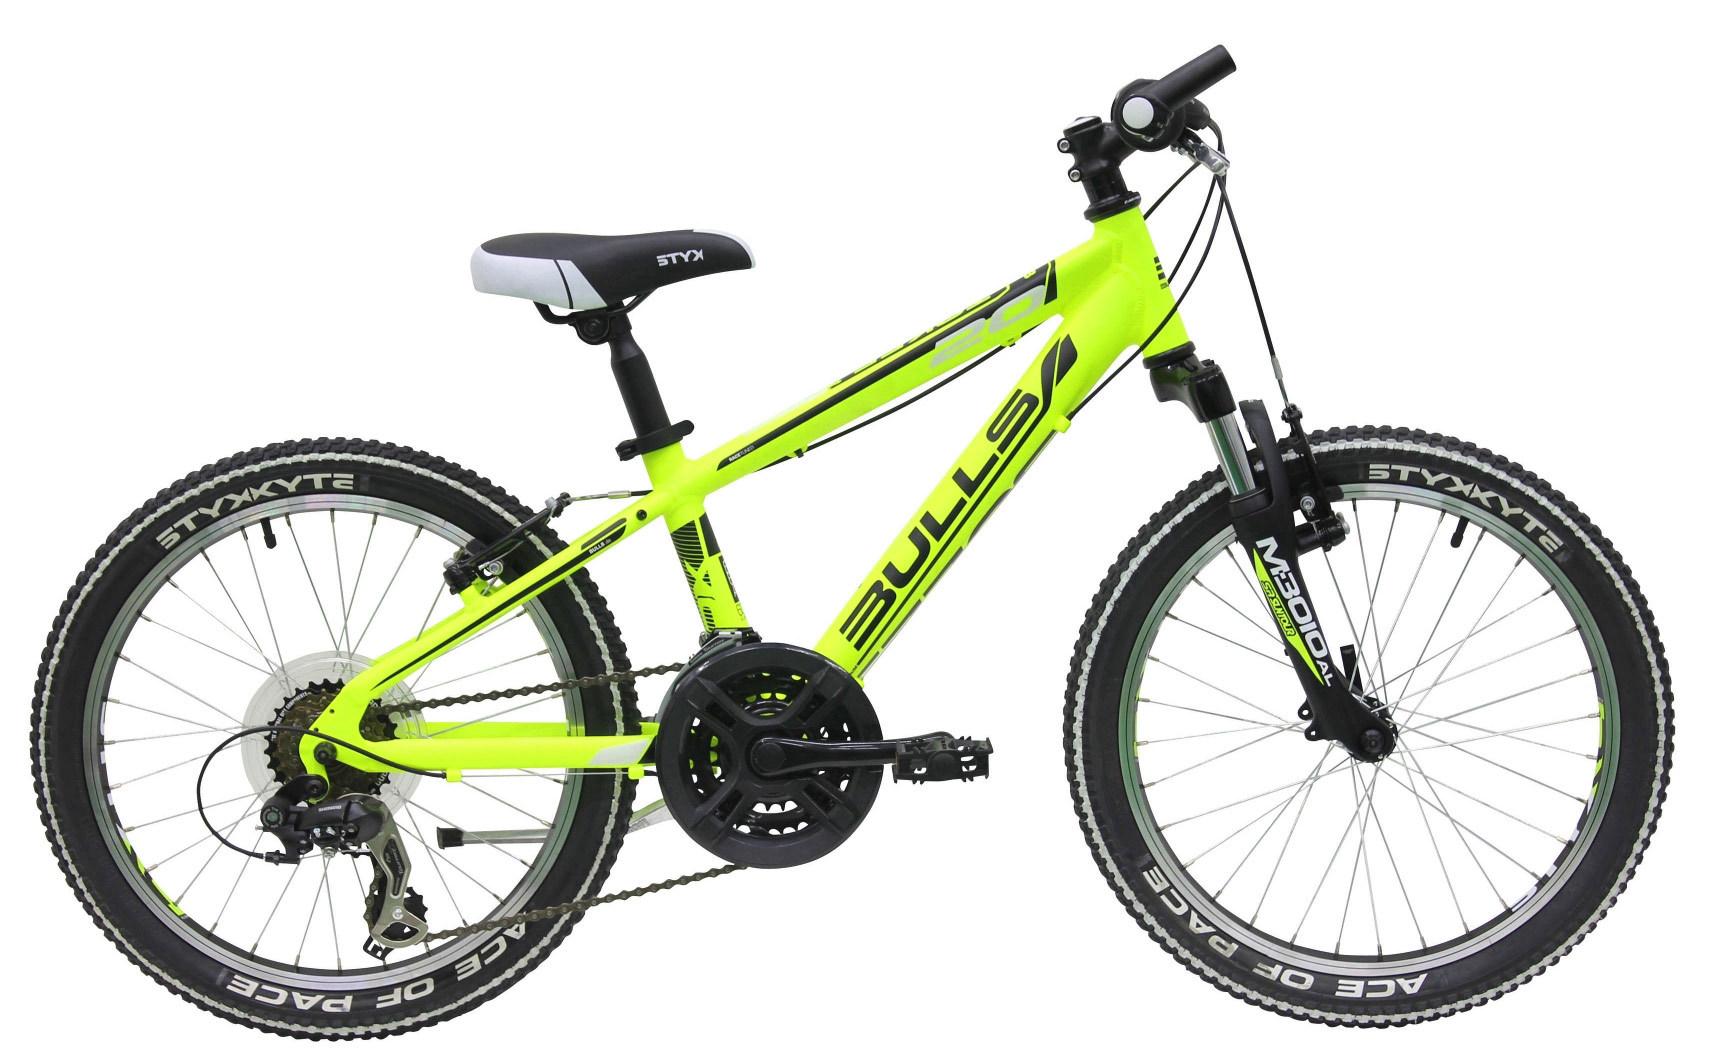 jugend mountainbike fahrrad bulls tokee 24 zoll shimano neon gelb 32 cm 2015 ebay. Black Bedroom Furniture Sets. Home Design Ideas